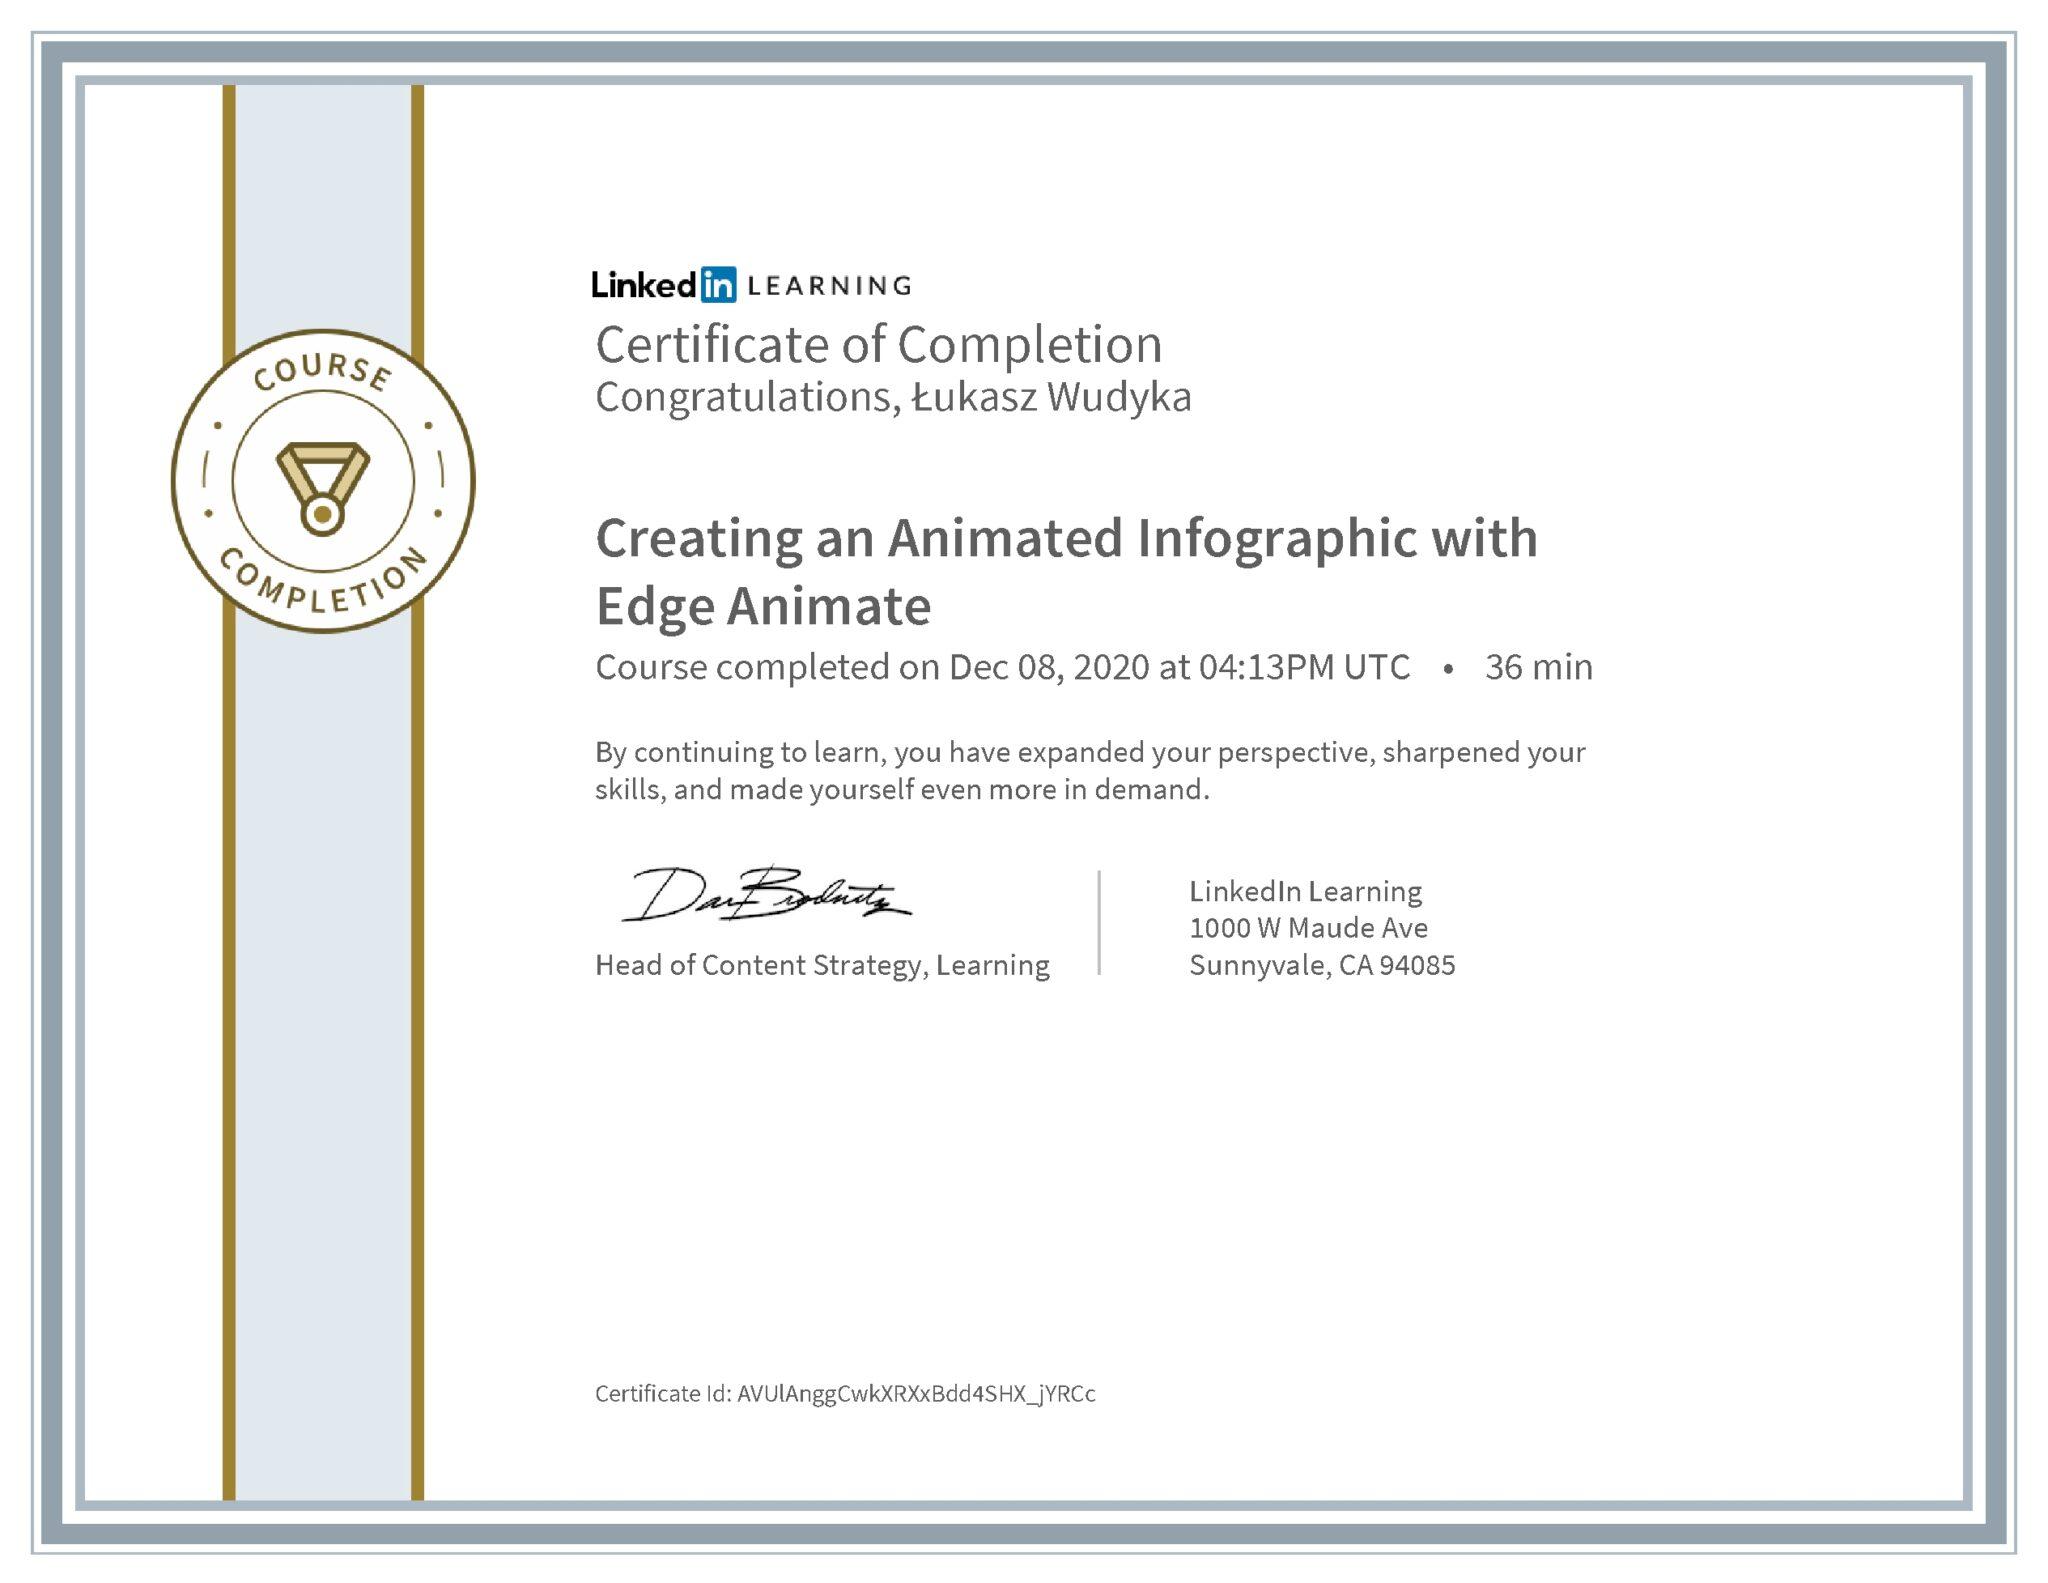 Łukasz Wudyka certyfikat LinkedIn Creating an Animated Infographic with Edge Animate